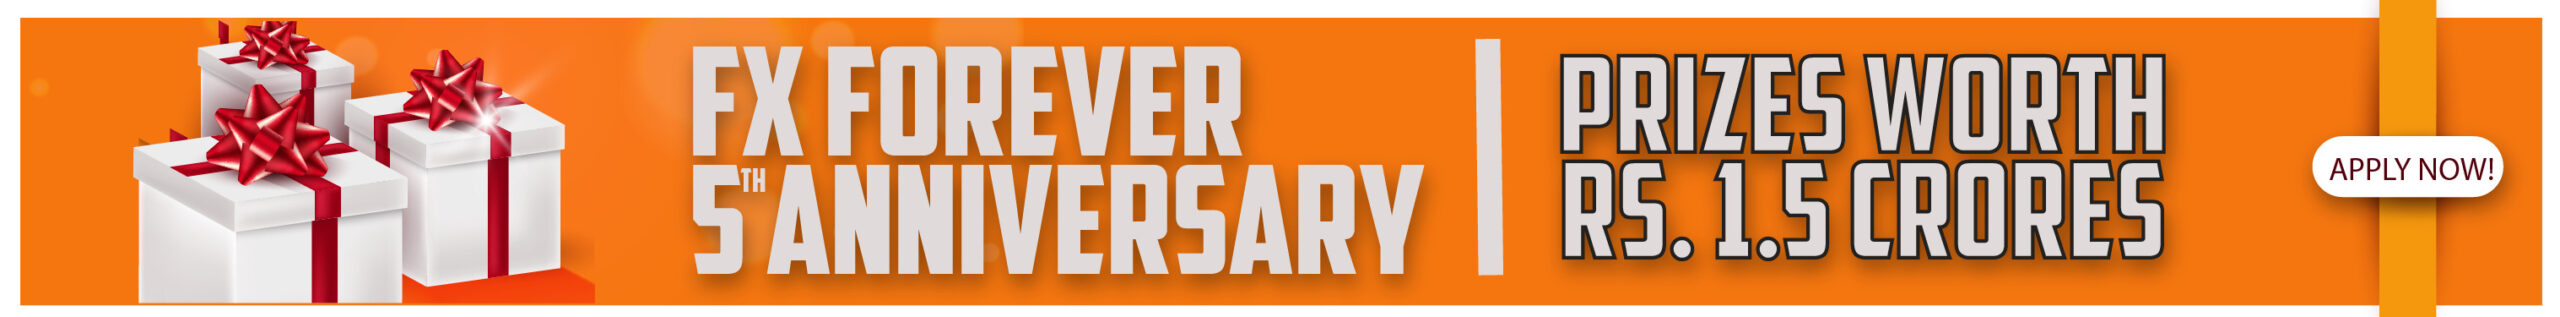 FxForever-Anniversary